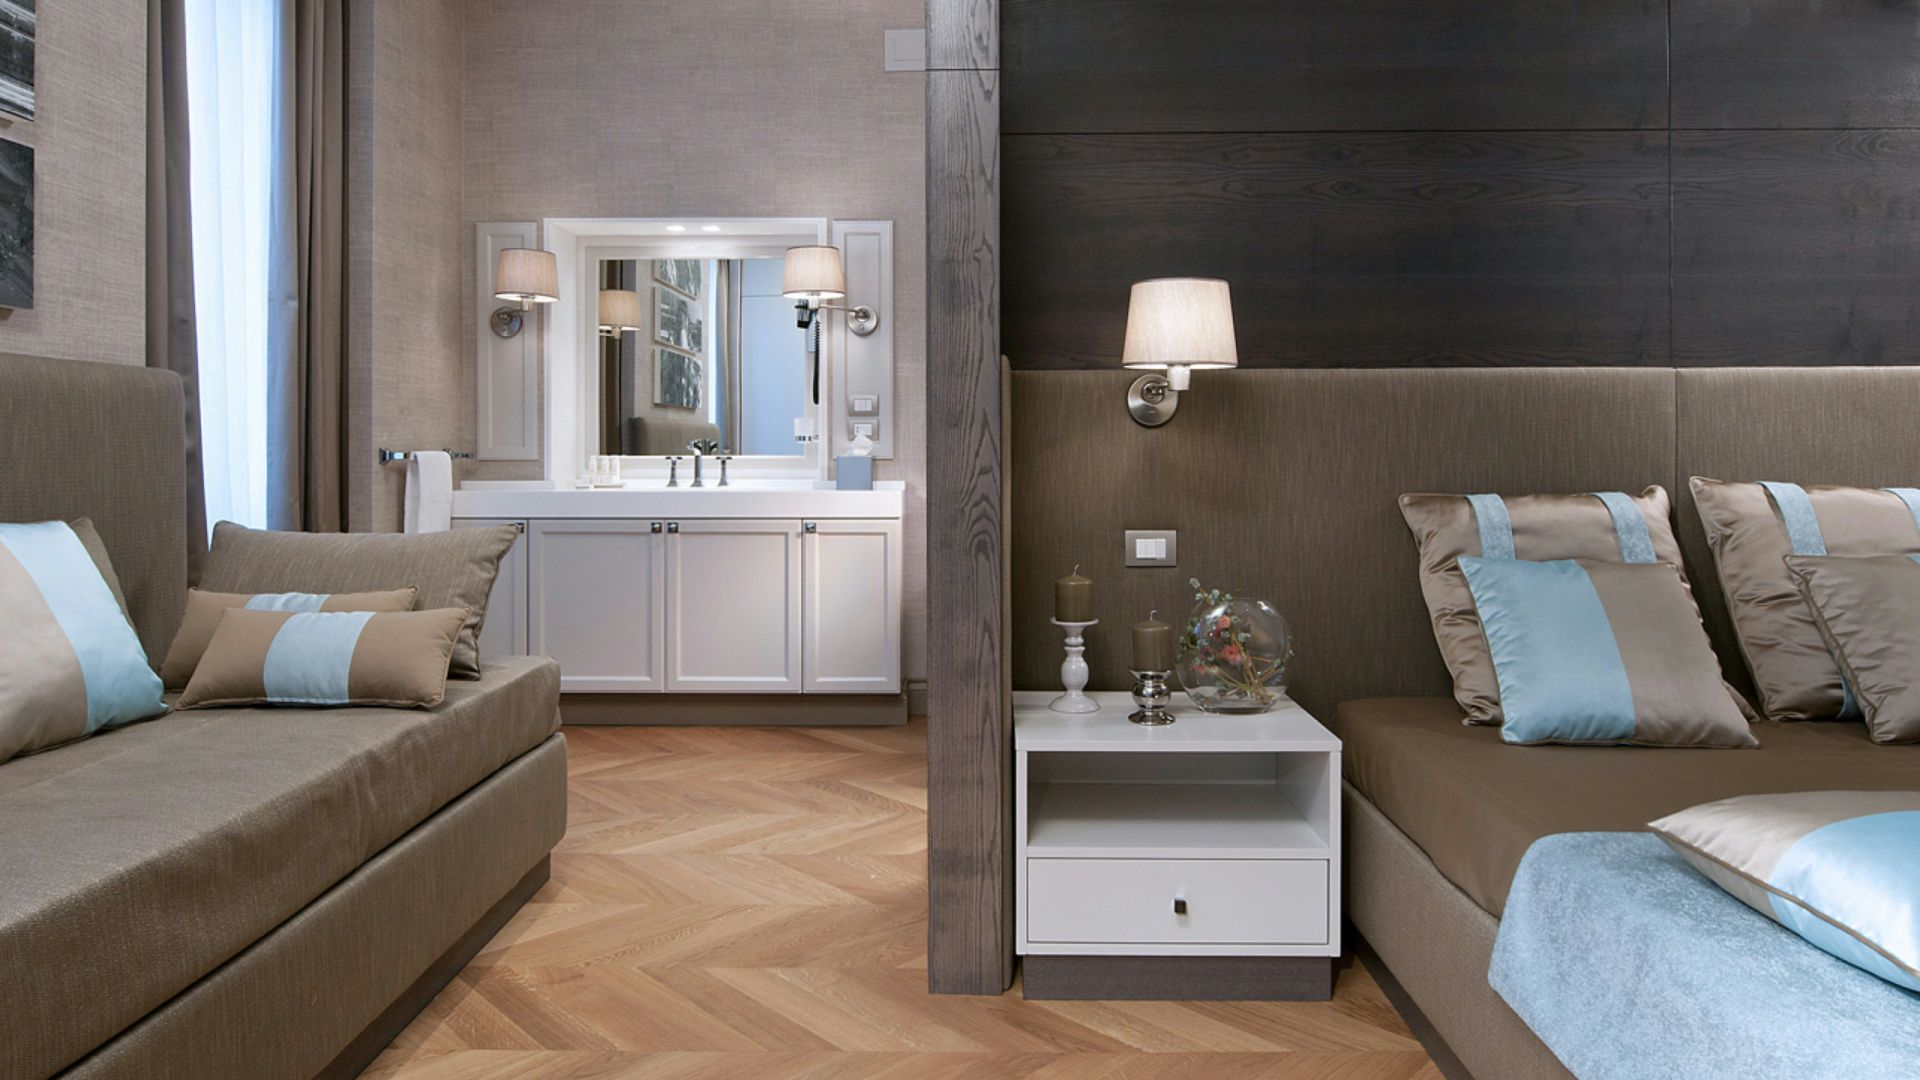 San-Carlo-Suite-Rome-deluxe-suite-3